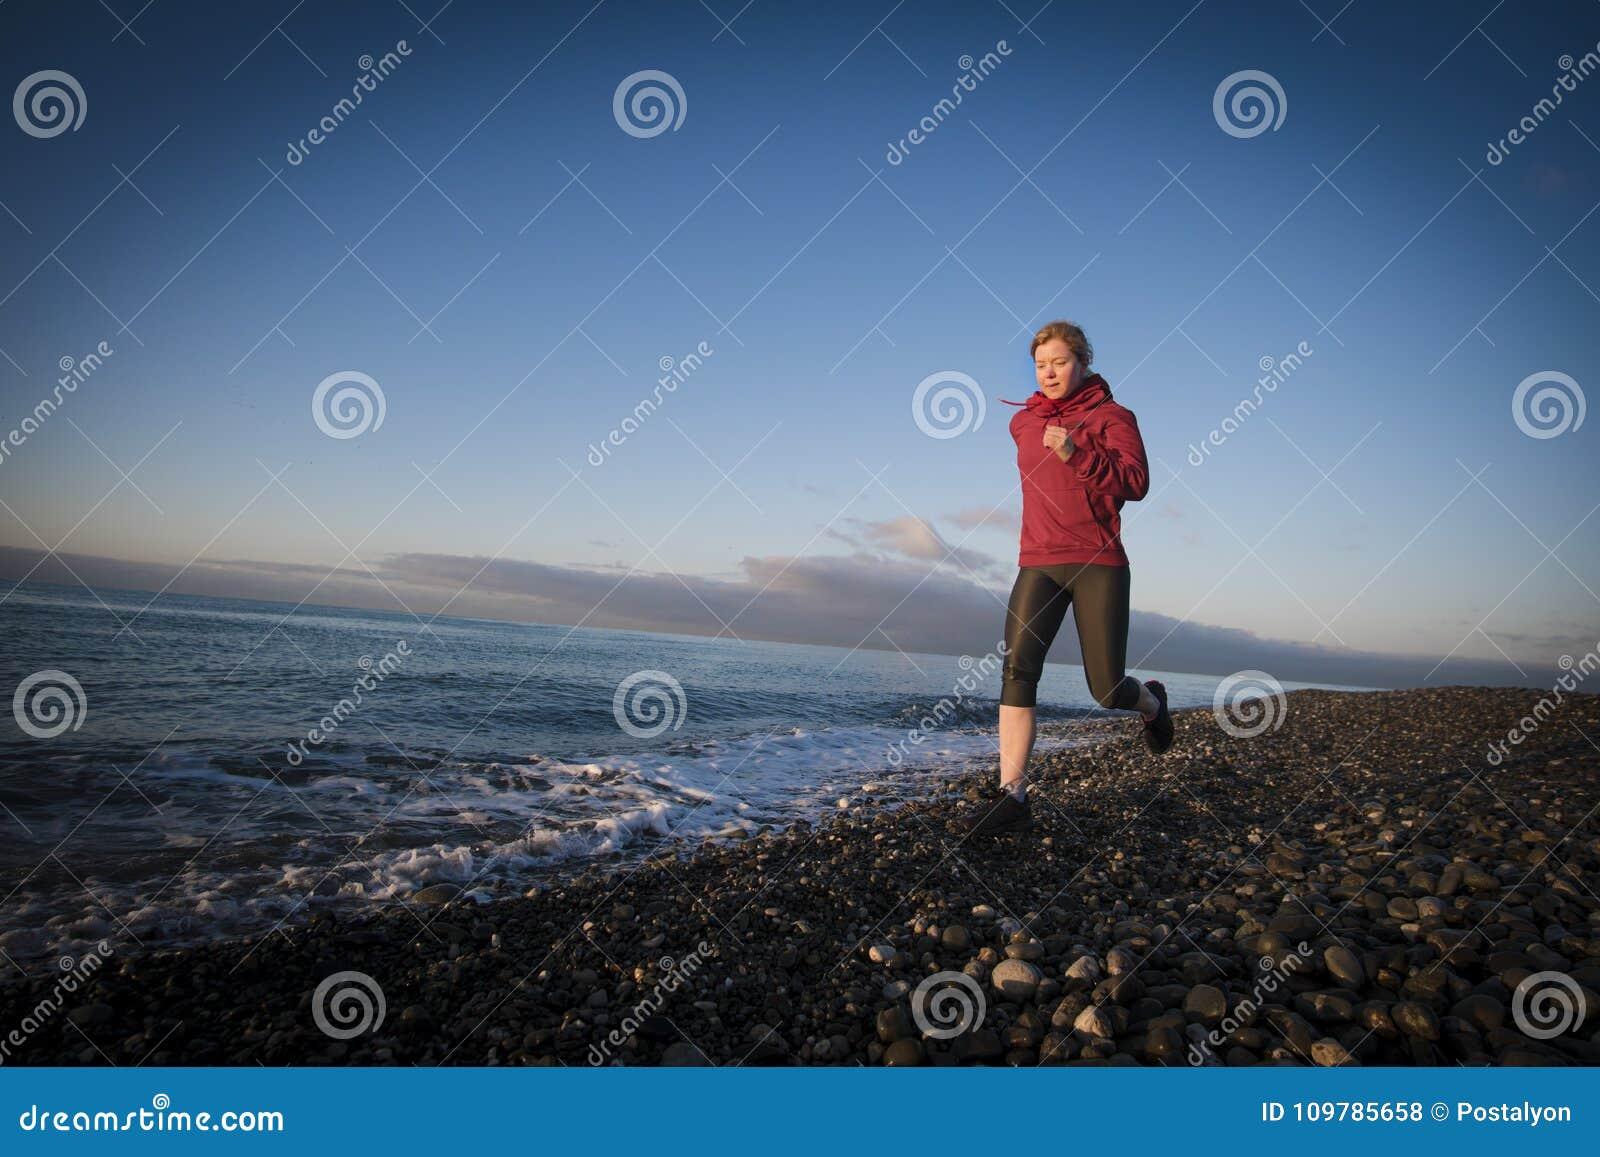 Adult woman runner running on sunrise seaside. Healthy lifestyle